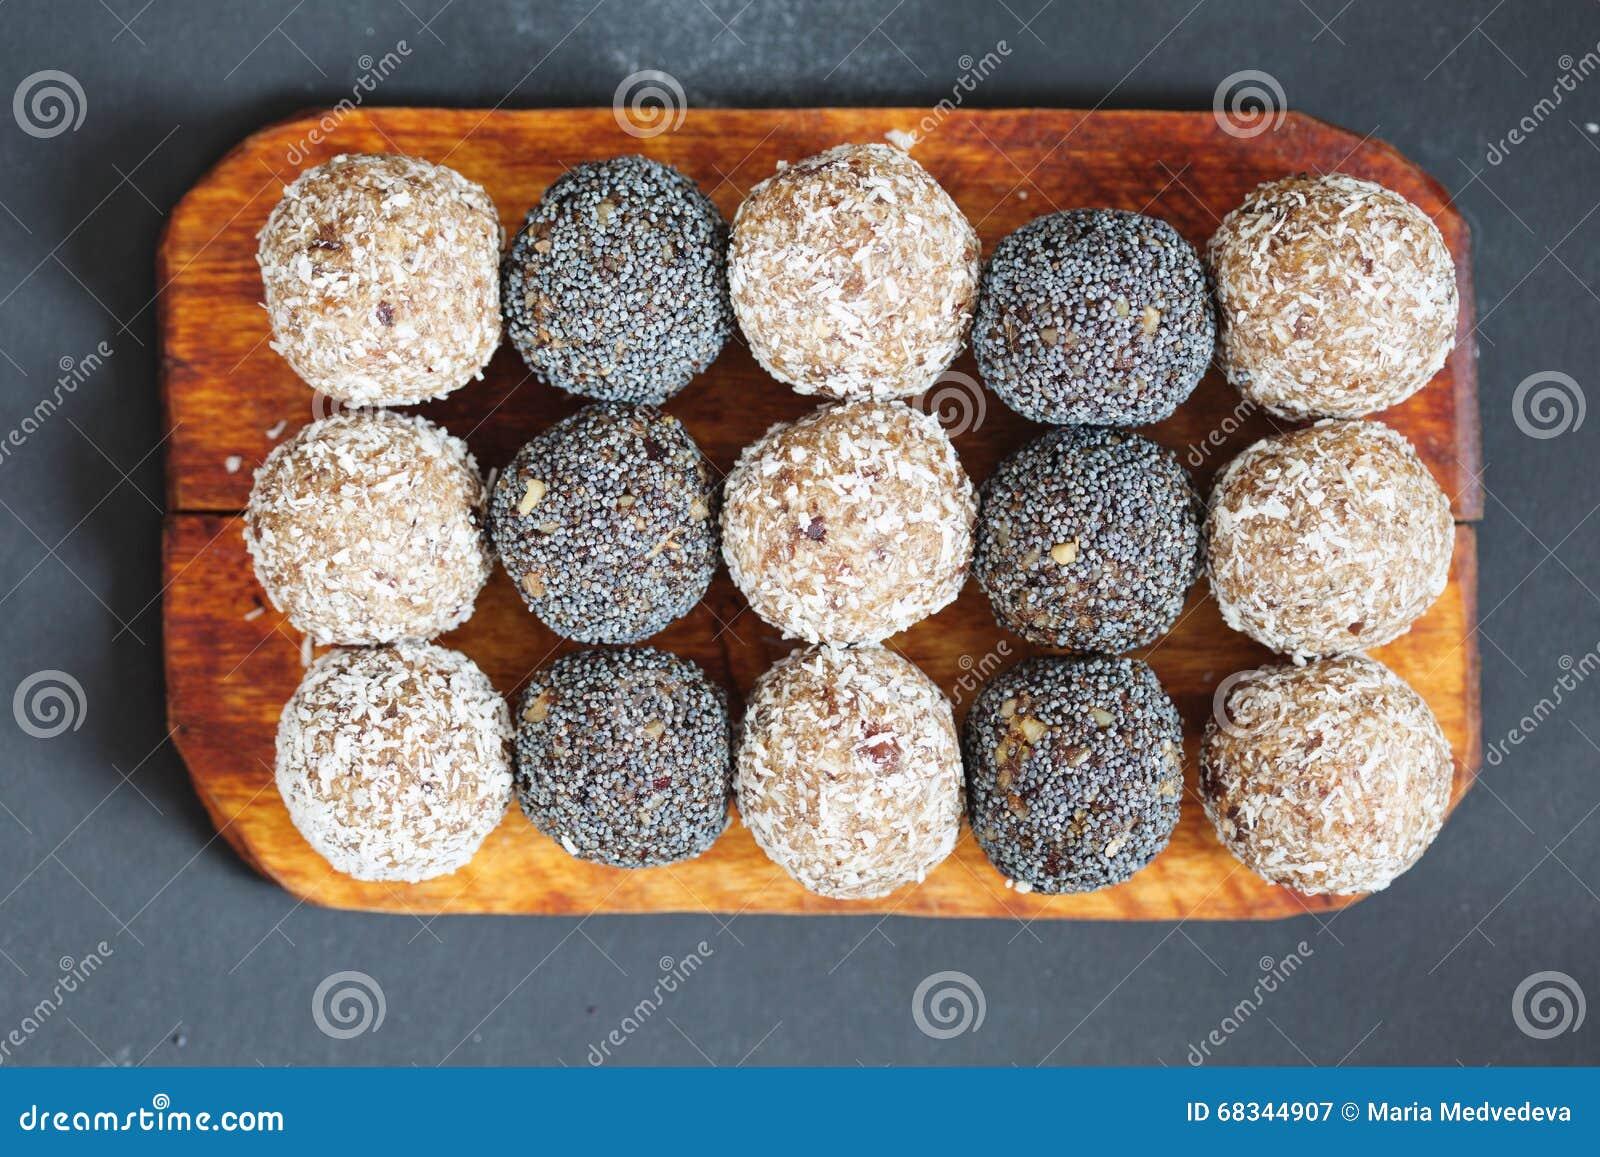 Assorted raw vegan sweets